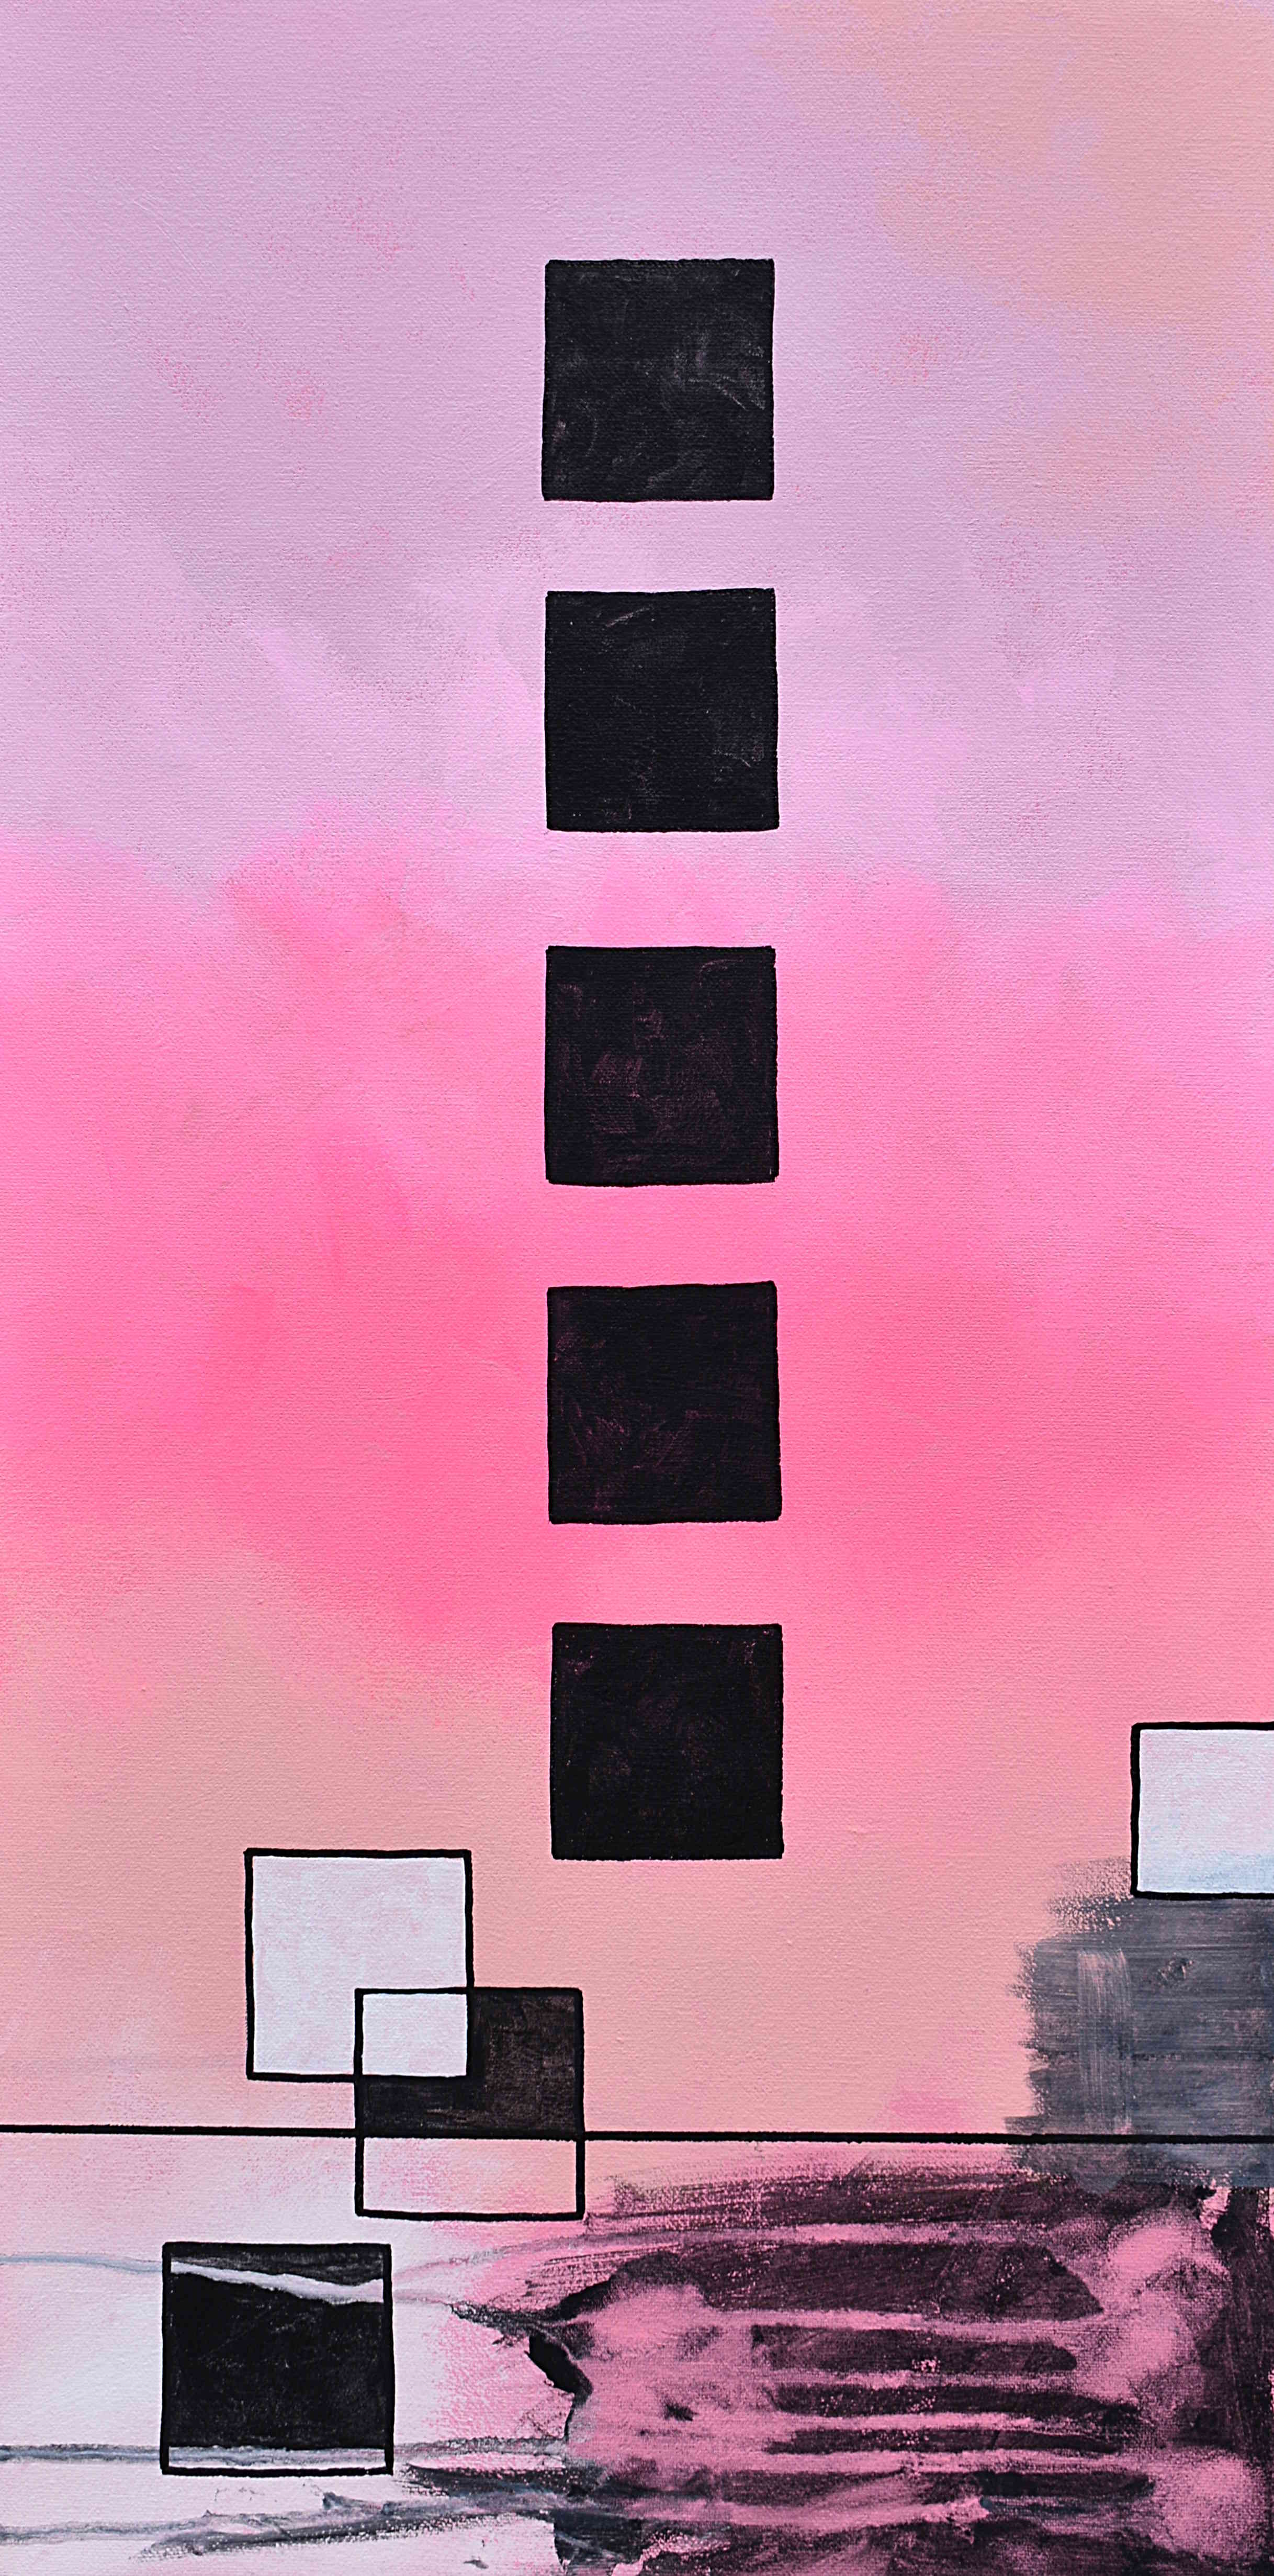 Black Squares in Pink